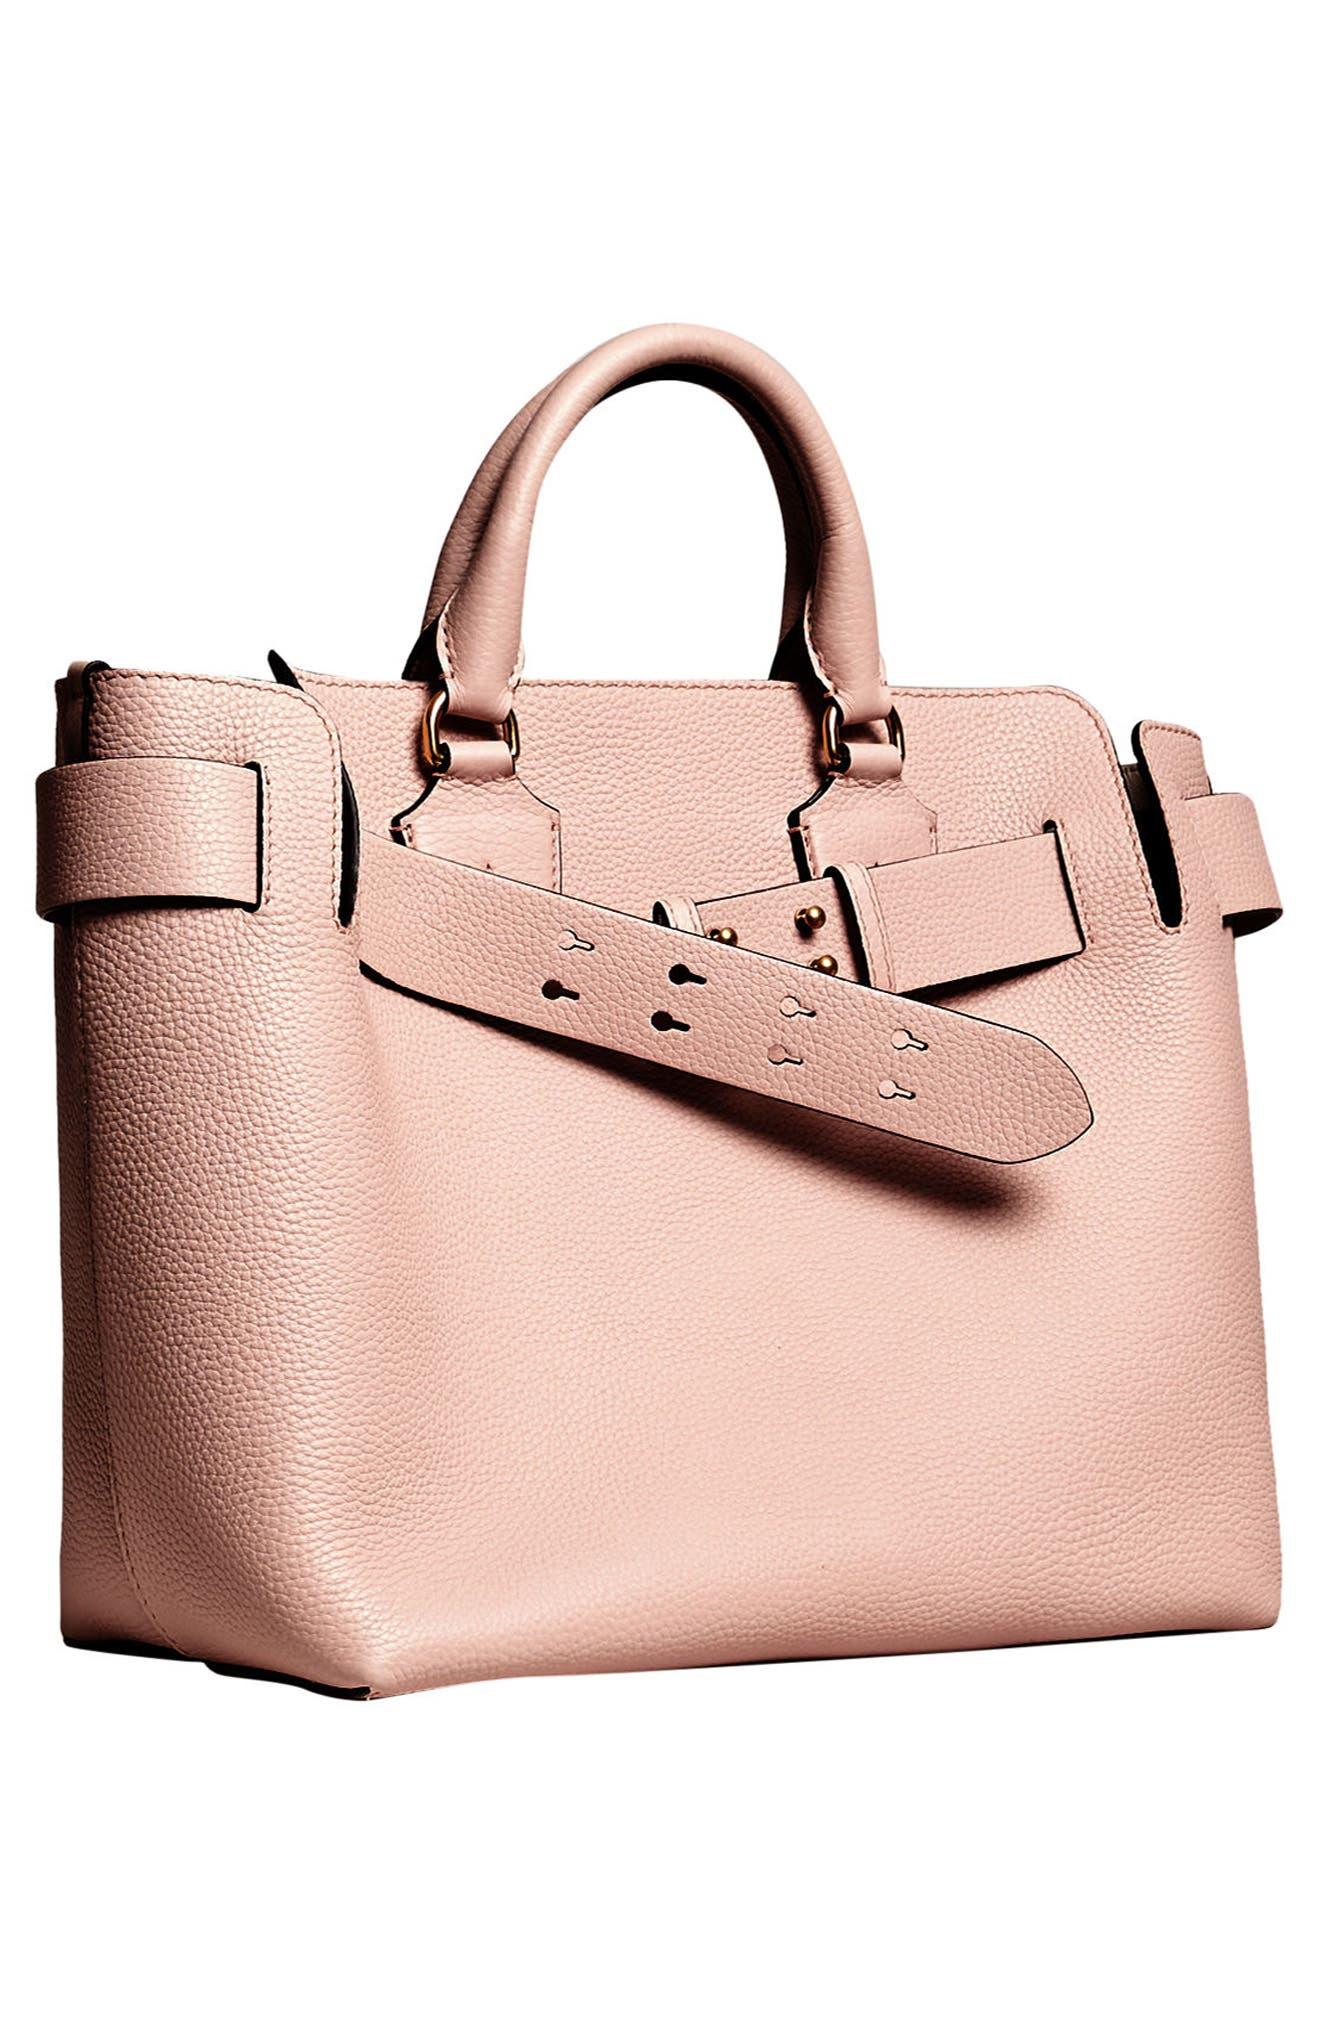 Medium Belt Bag Leather Tote,                             Alternate thumbnail 6, color,                             PALE ASH ROSE